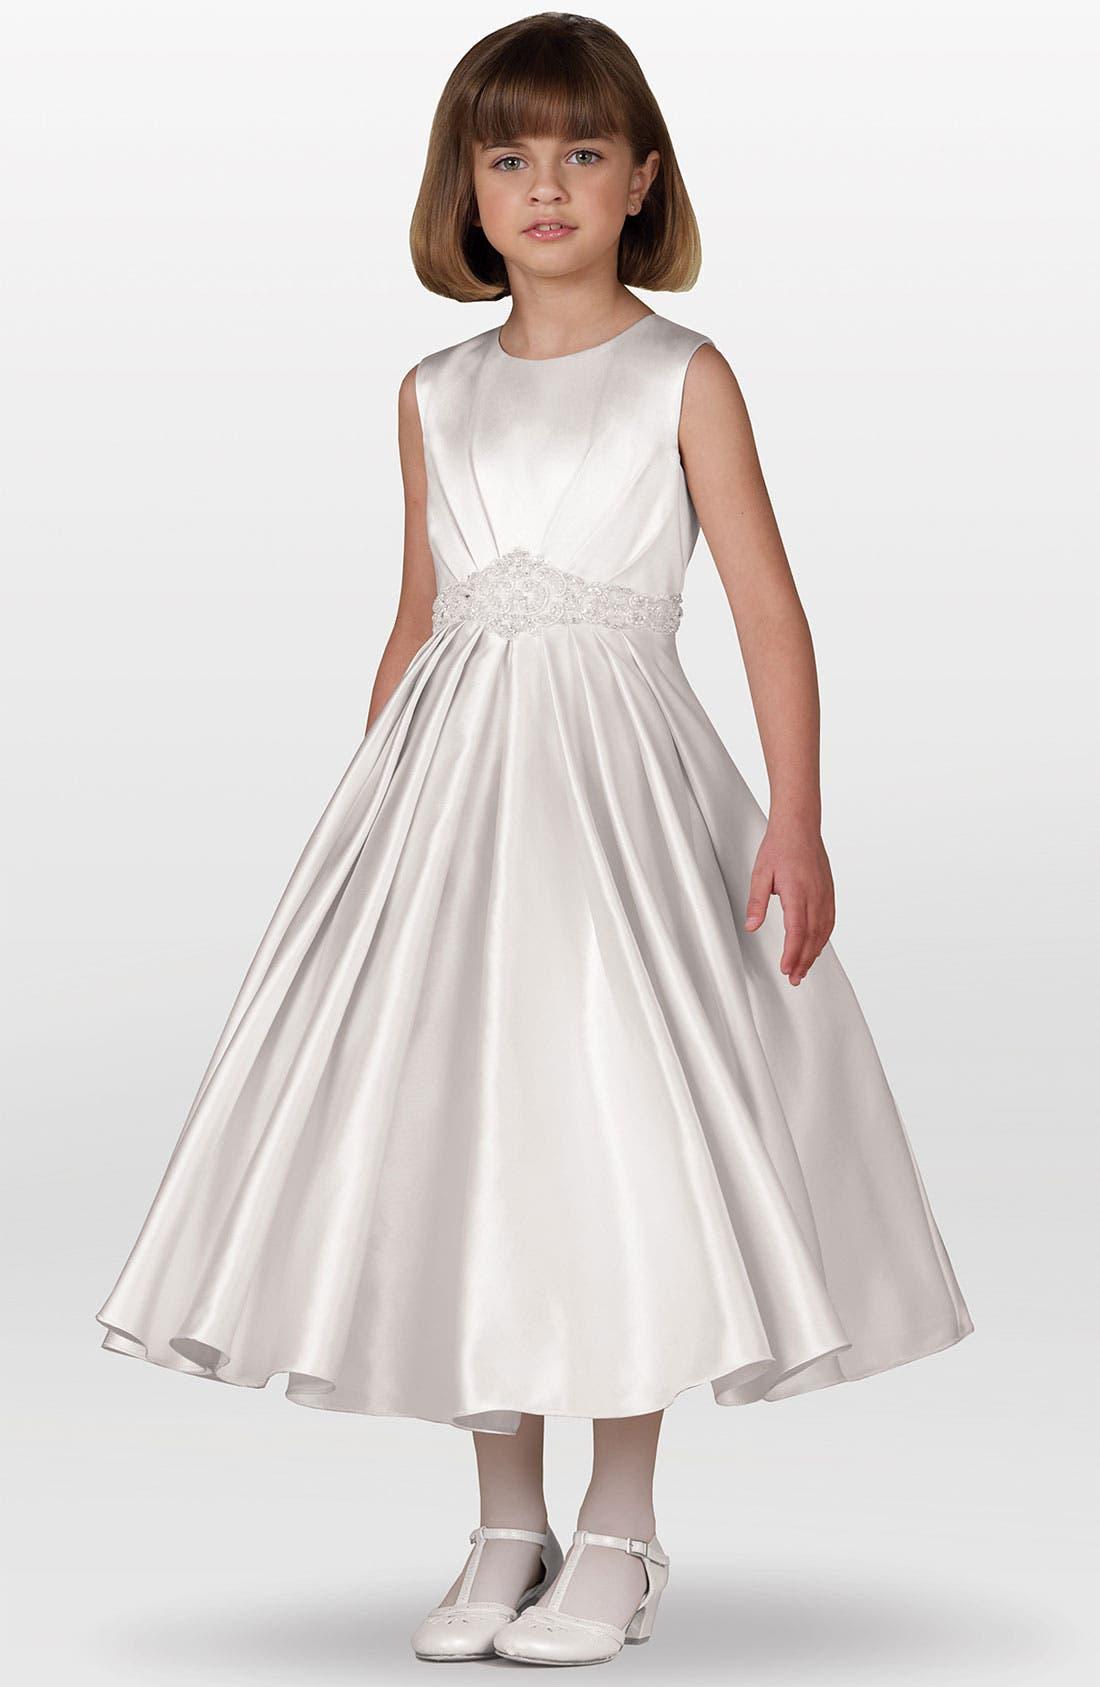 Alternate Image 1 Selected - Joan Calabrese for Mon Cheri Jeweled Waist Dress (Little Girls & Big Girls)